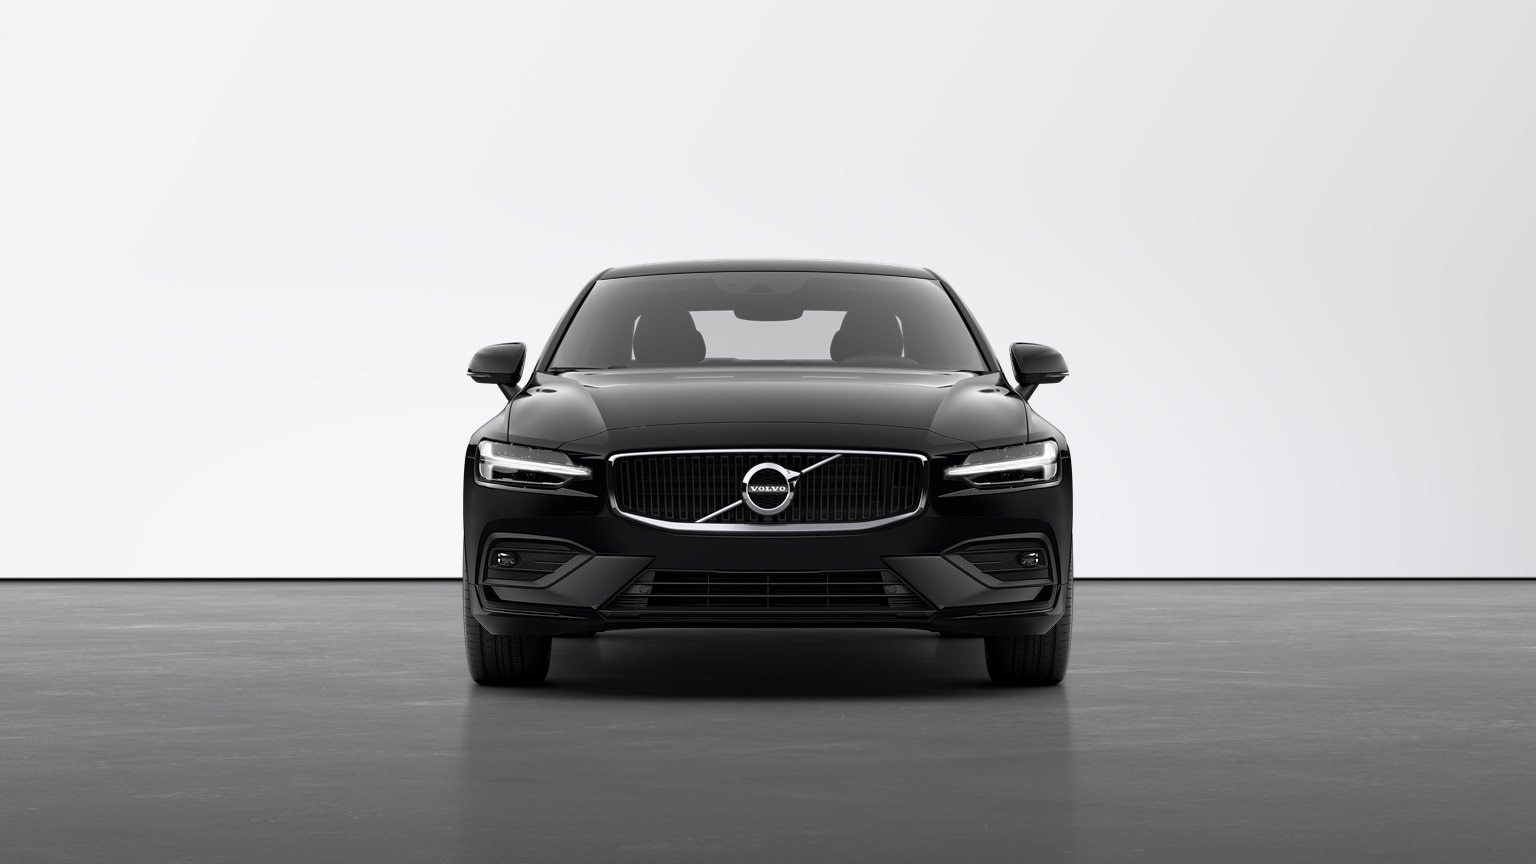 Volvo S60 Premium Edition Oferta Enero 2021 01